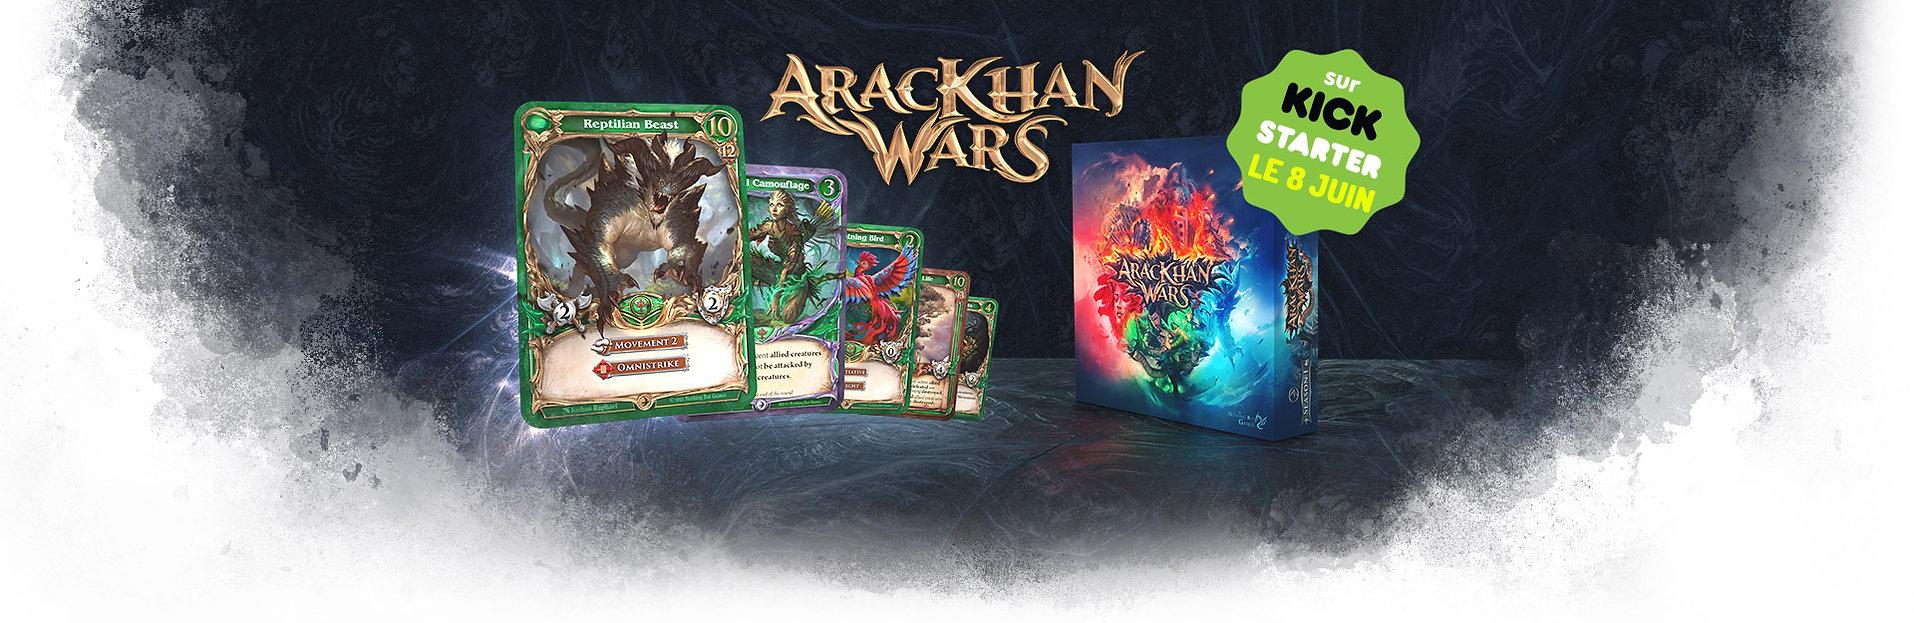 Bannière site AracKhan Wars KS.JPG